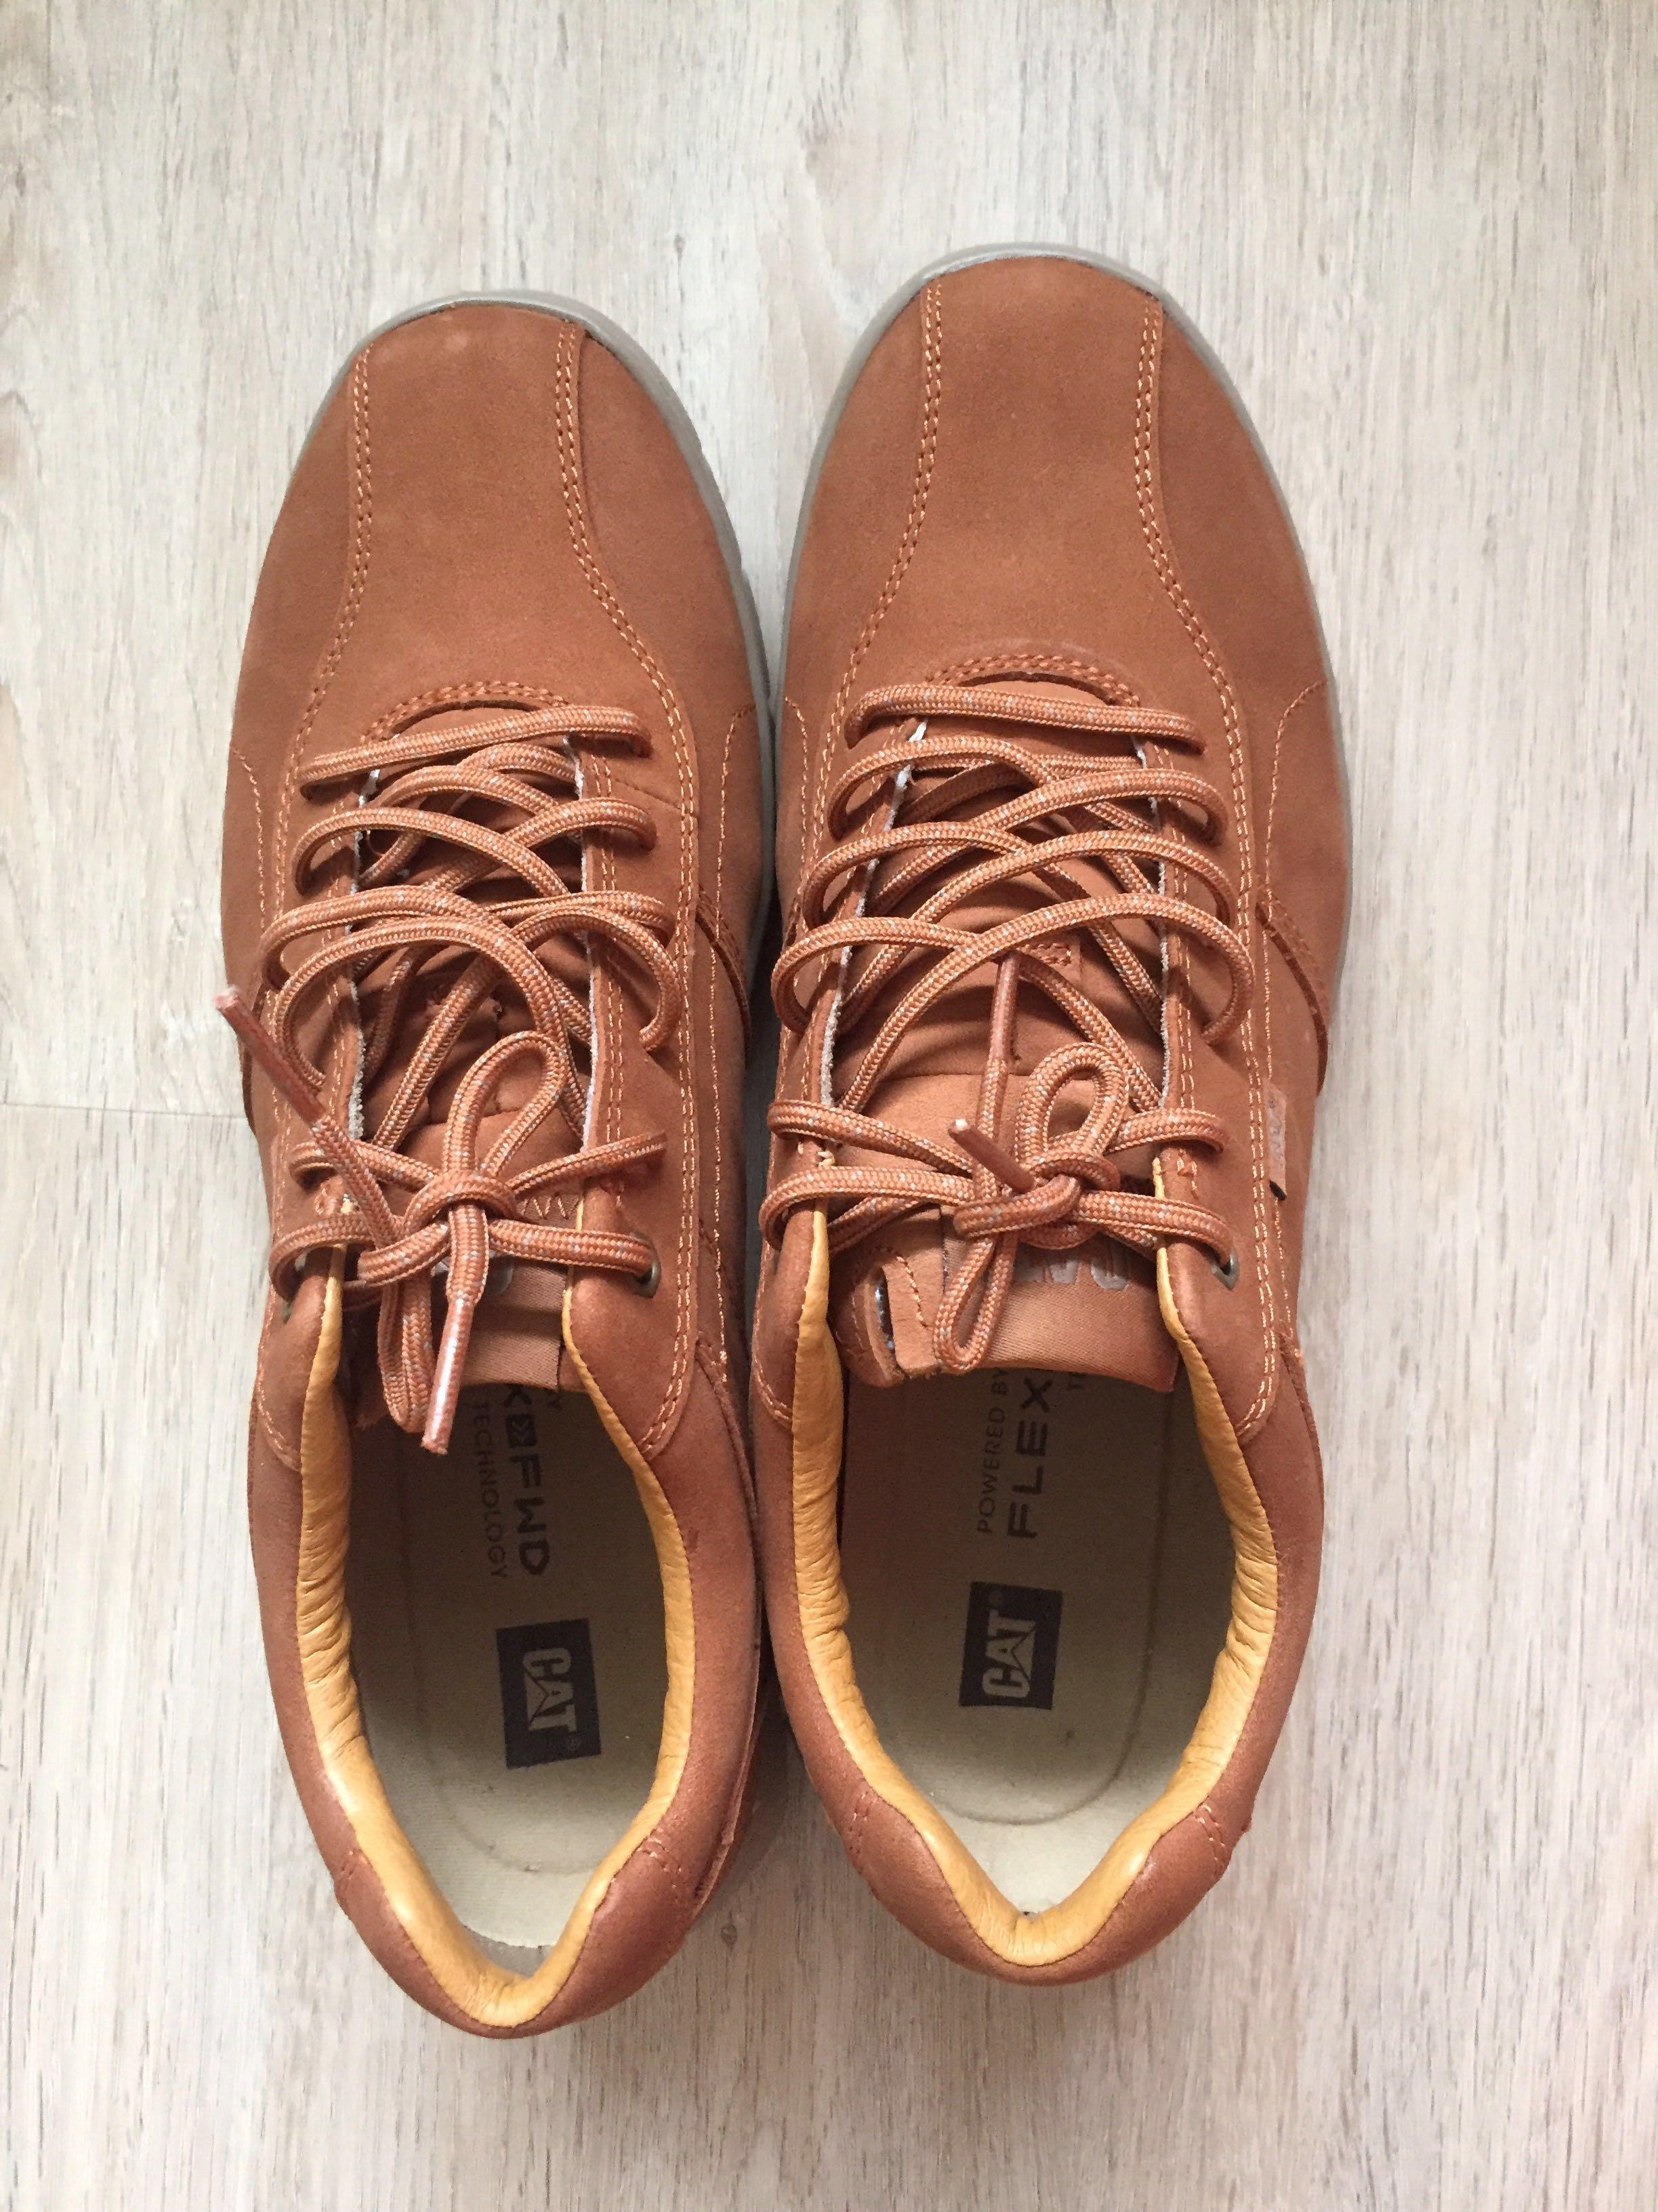 BNIB Caterpillar casual shoes, Men's